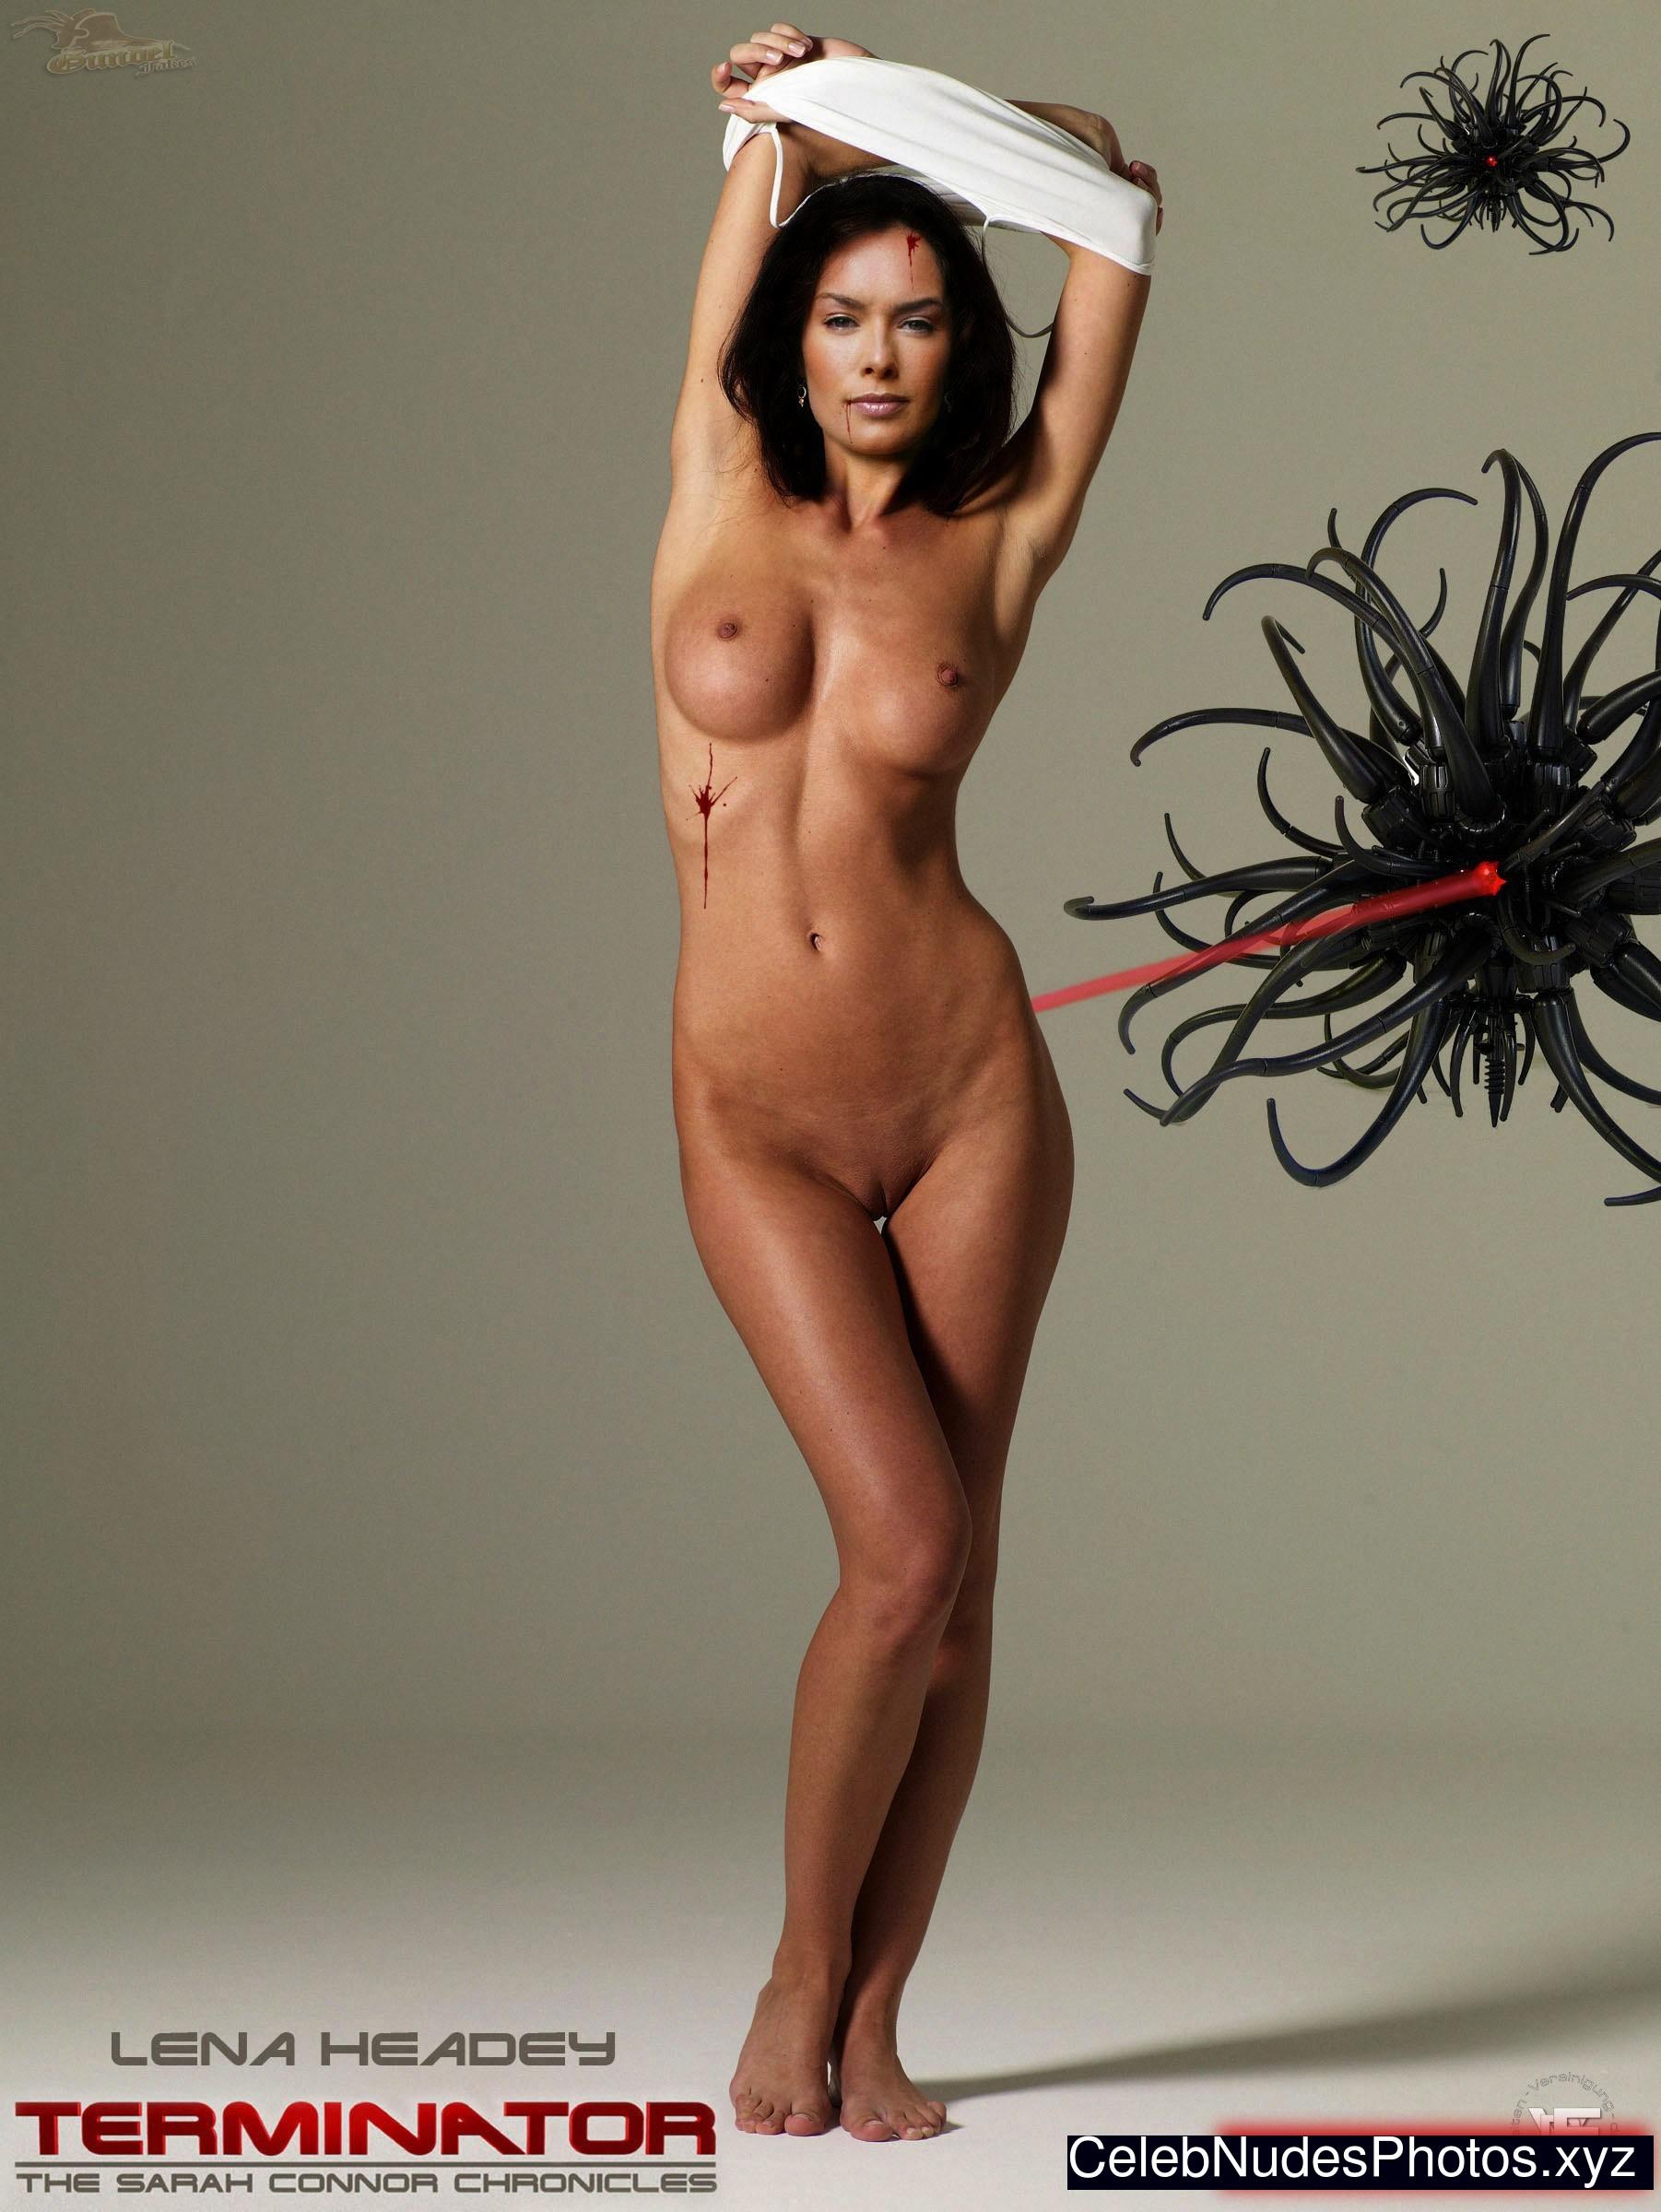 naked girl touching herself